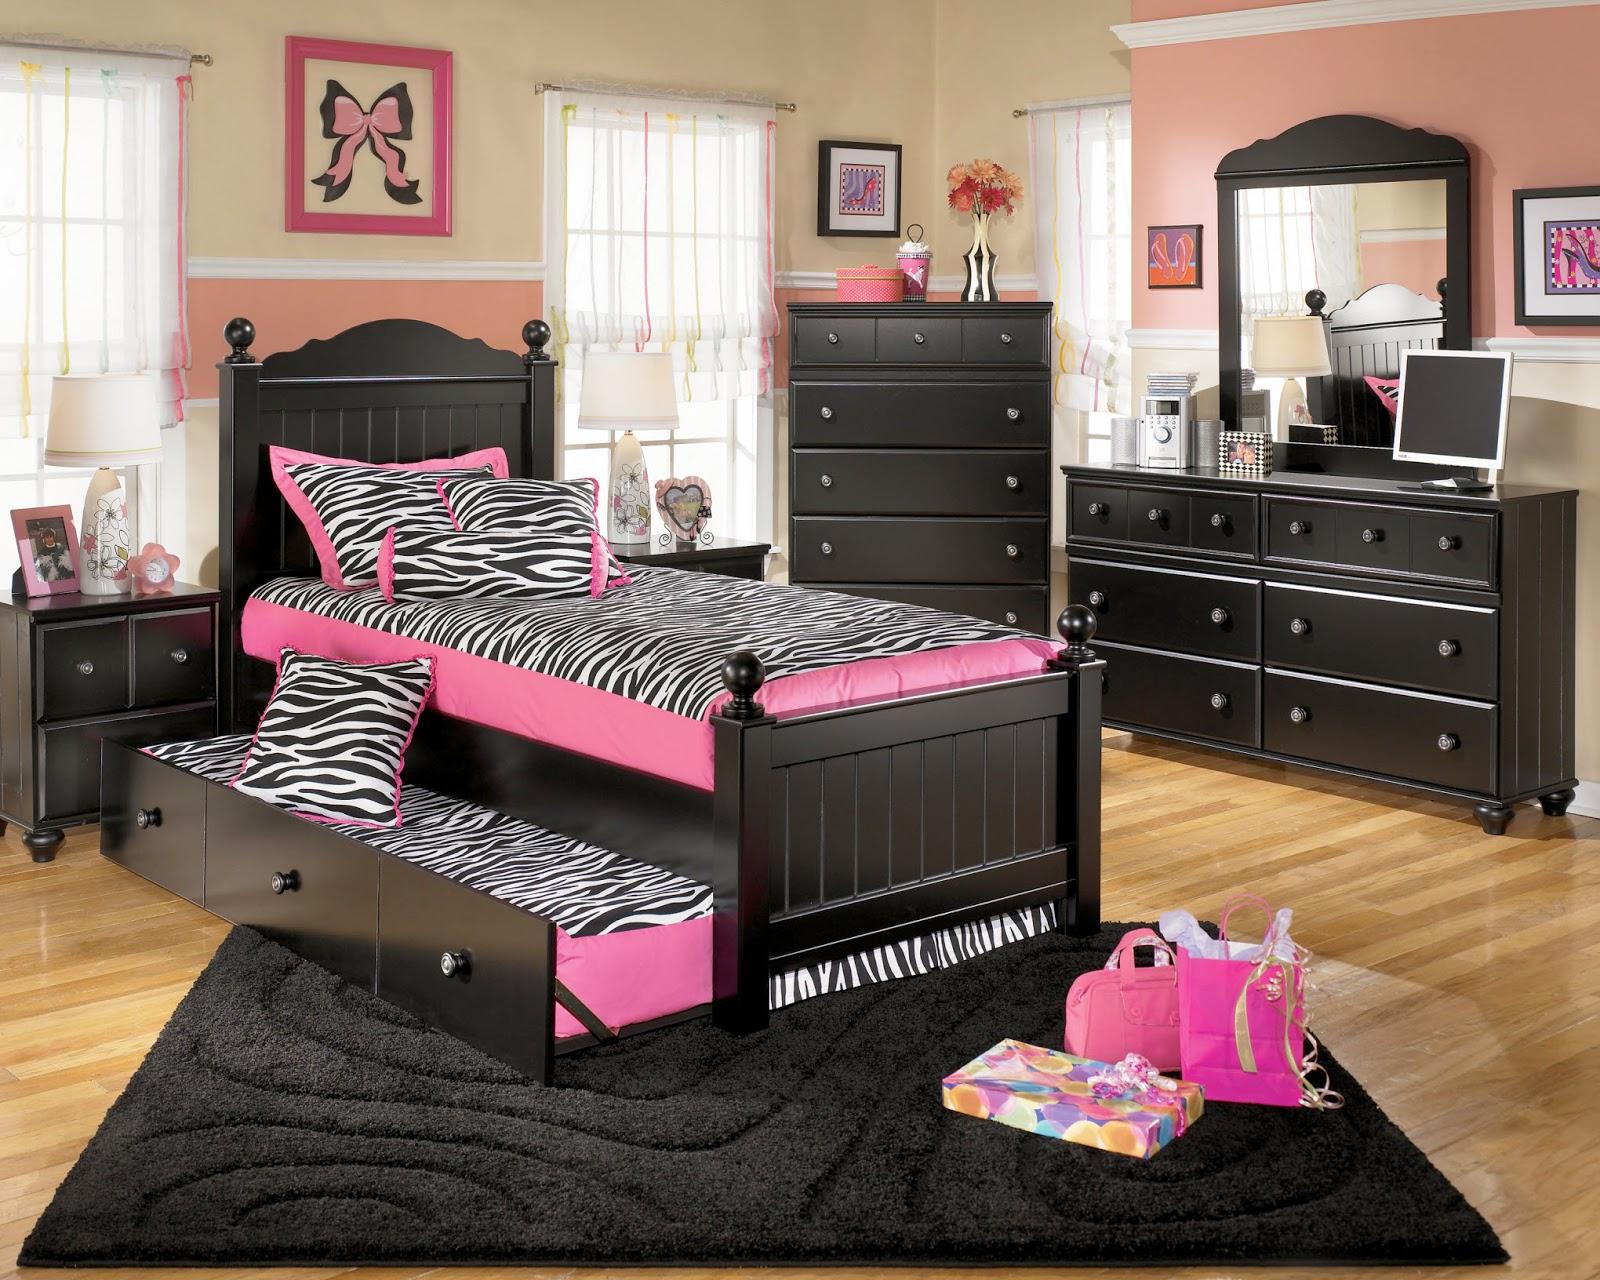 Custom Angel Kids Bedroom Furniture Sets for Girls Plan and Idea